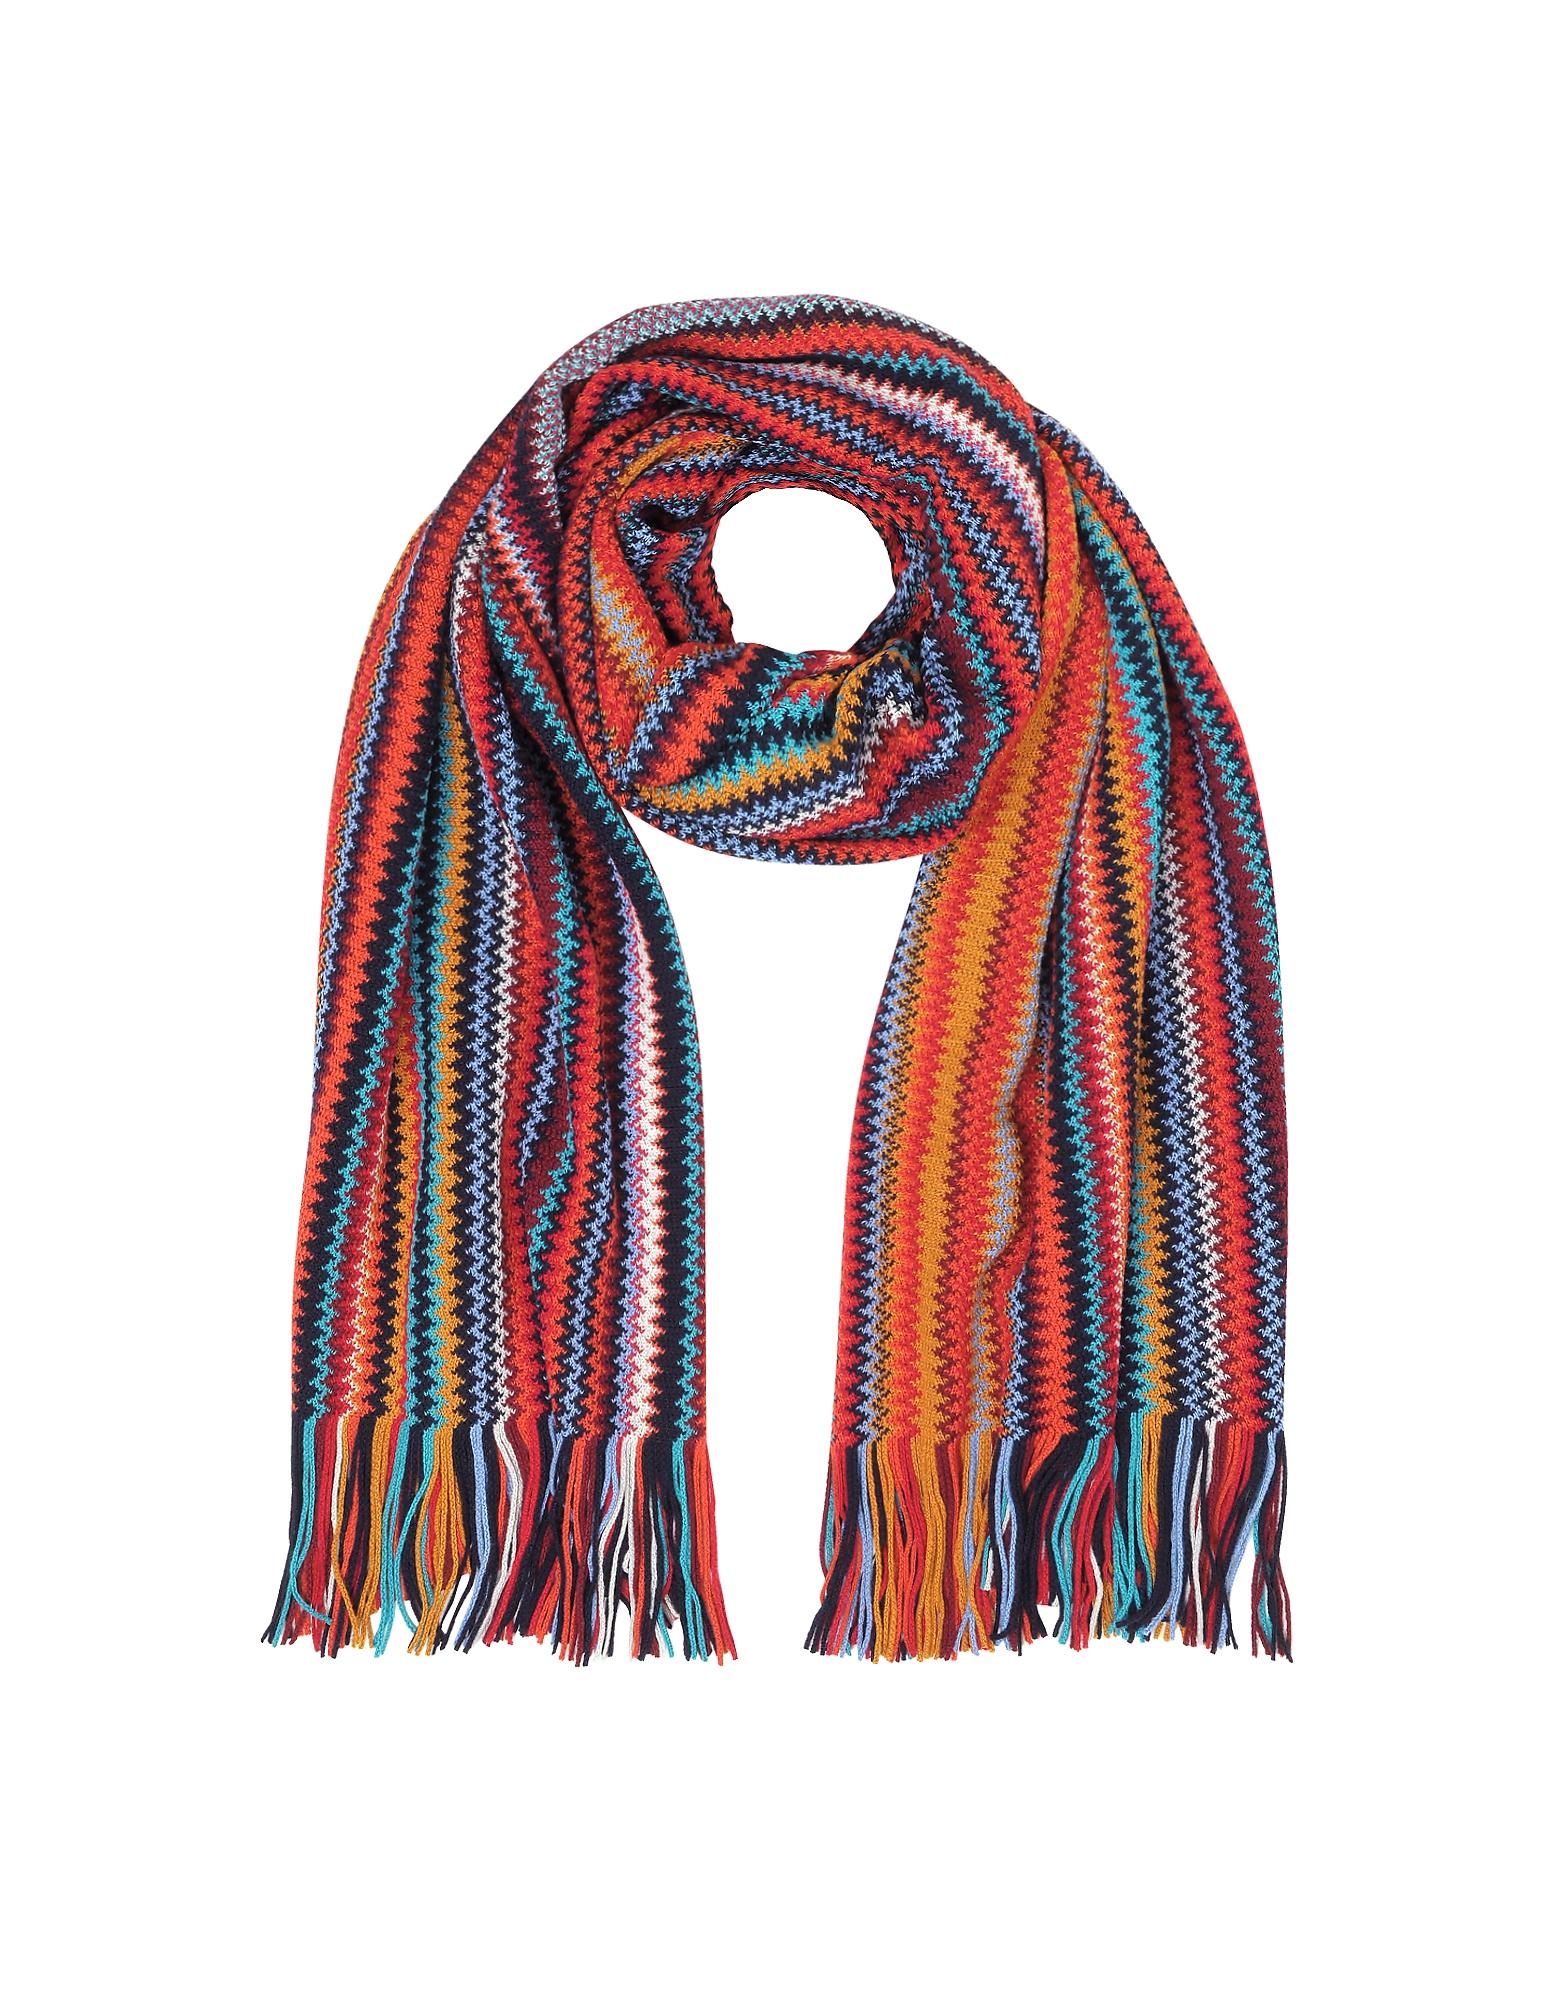 Red/Multicolor Wool Blend Fringed Men's Long Scarf